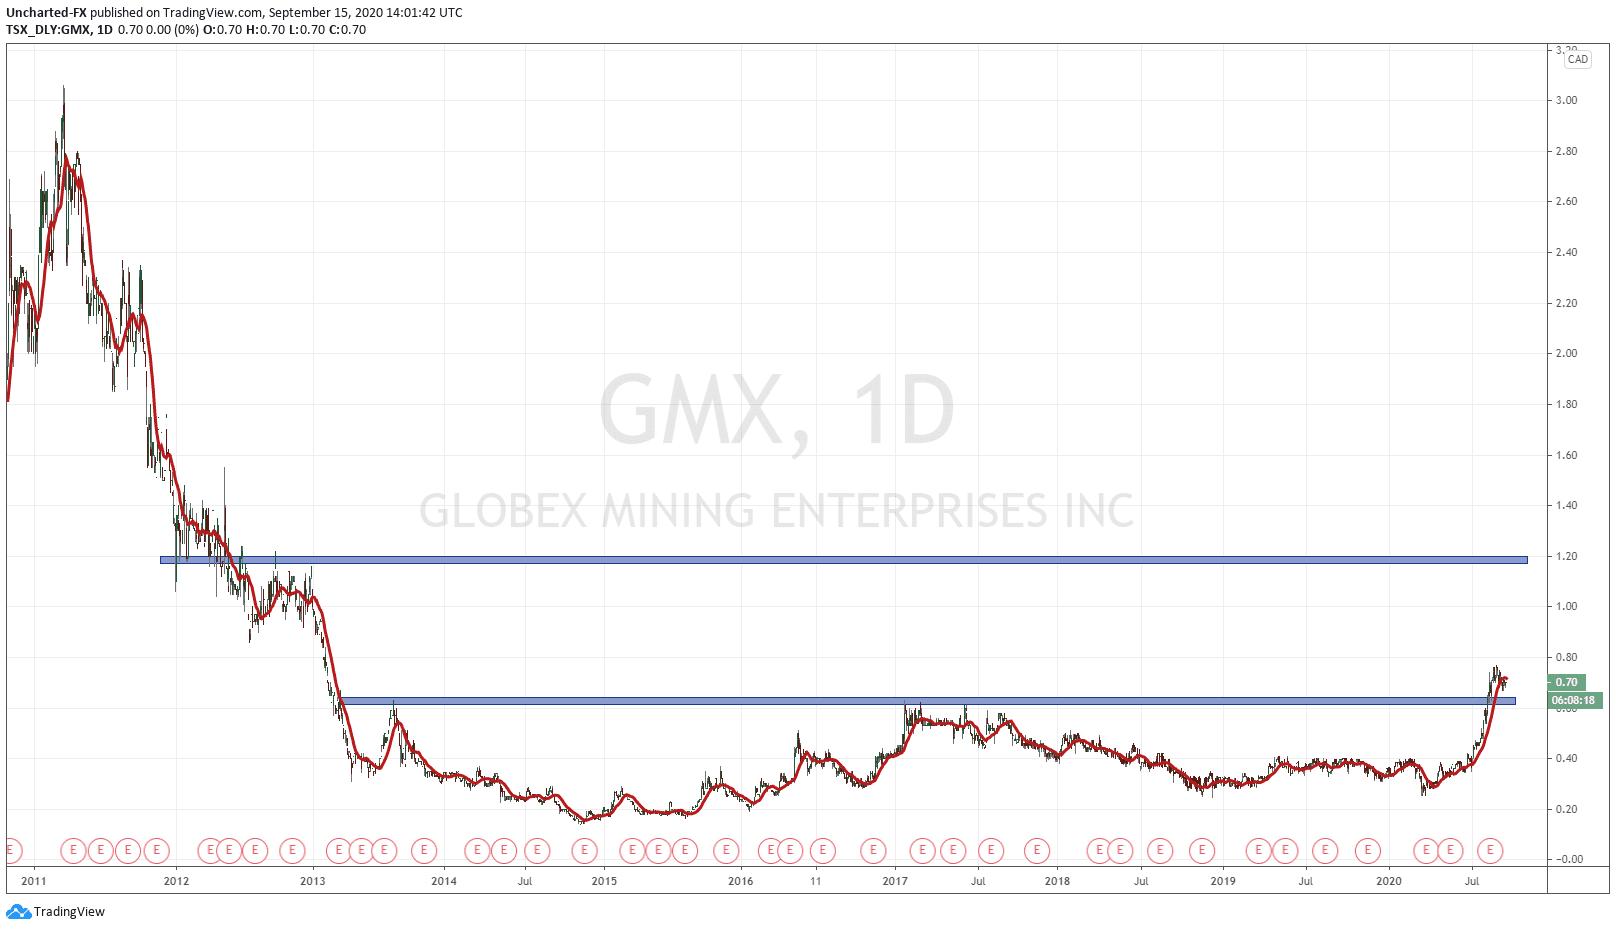 Globex Mining